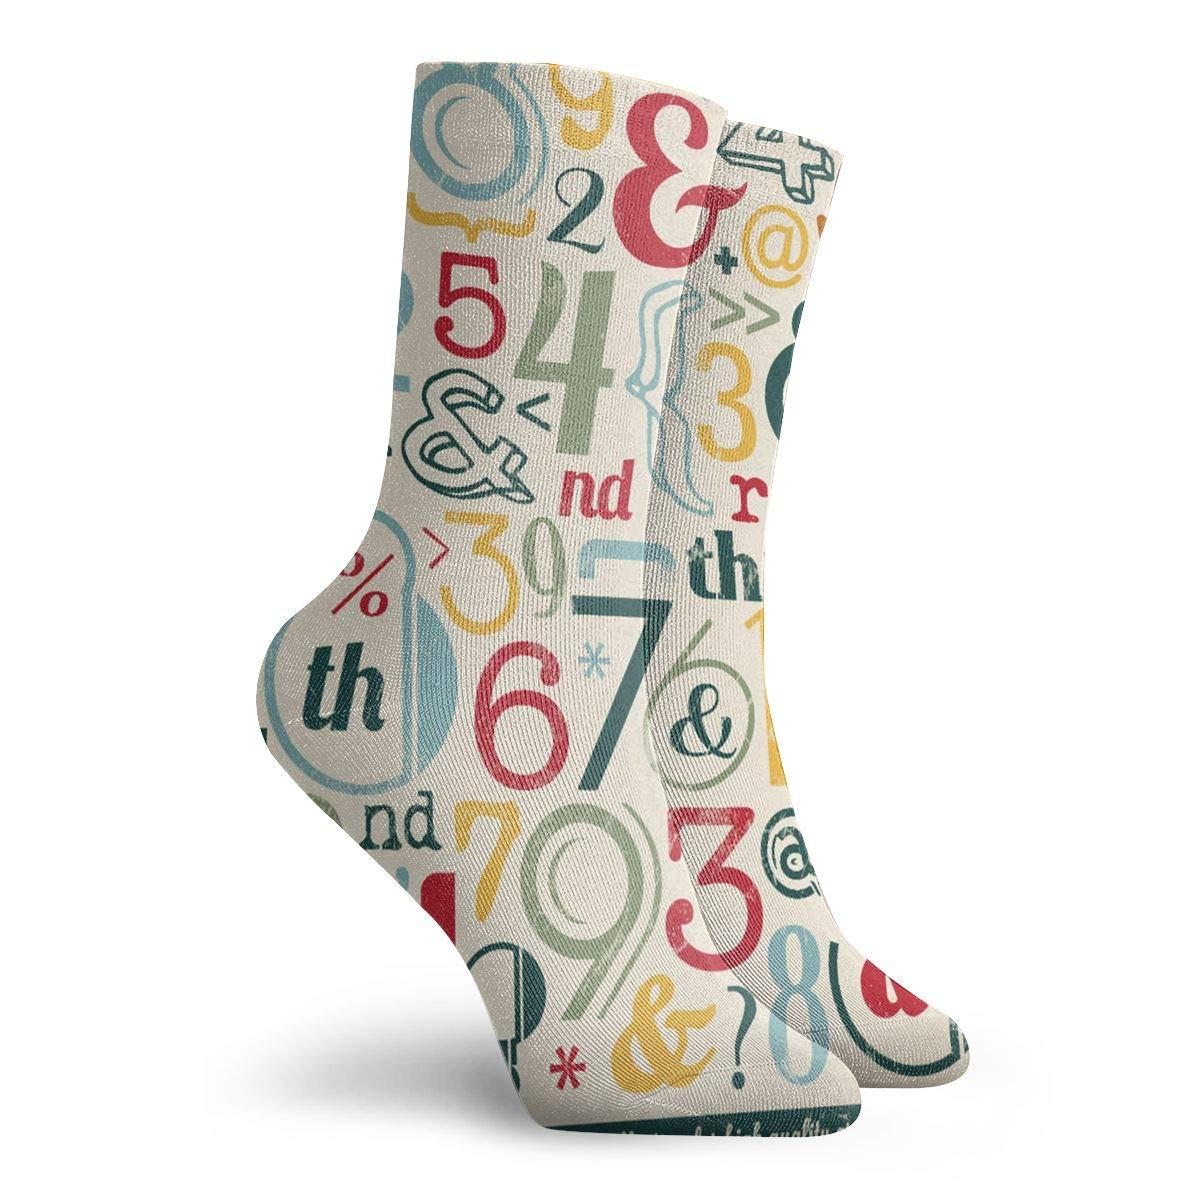 Numbers Unisex Funny Casual Crew Socks Athletic Socks For Boys Girls Kids Teenagers